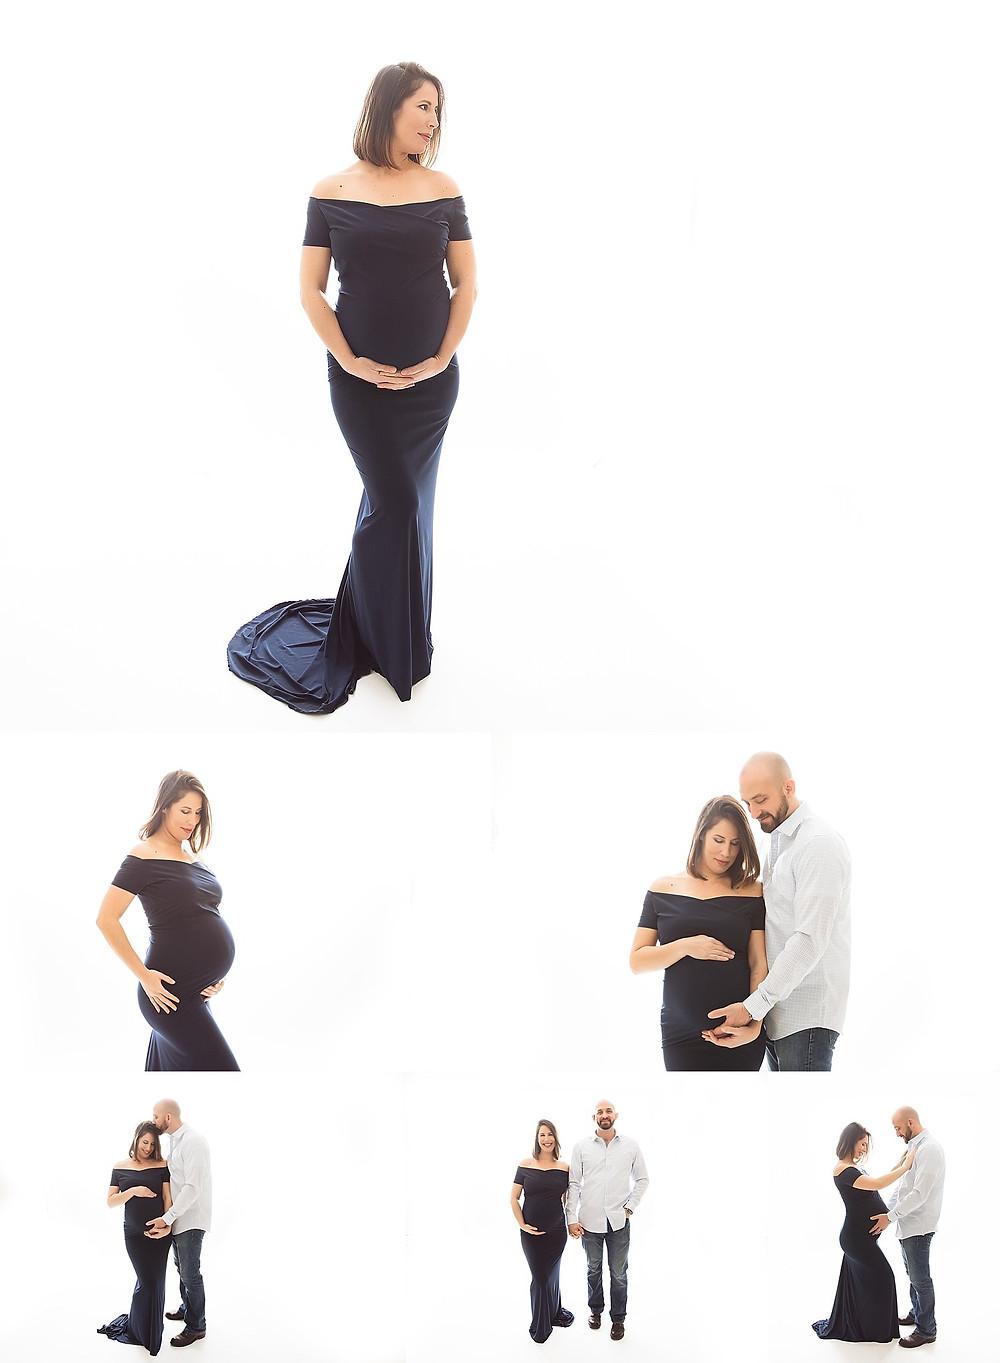 Maternity photographer new jersey